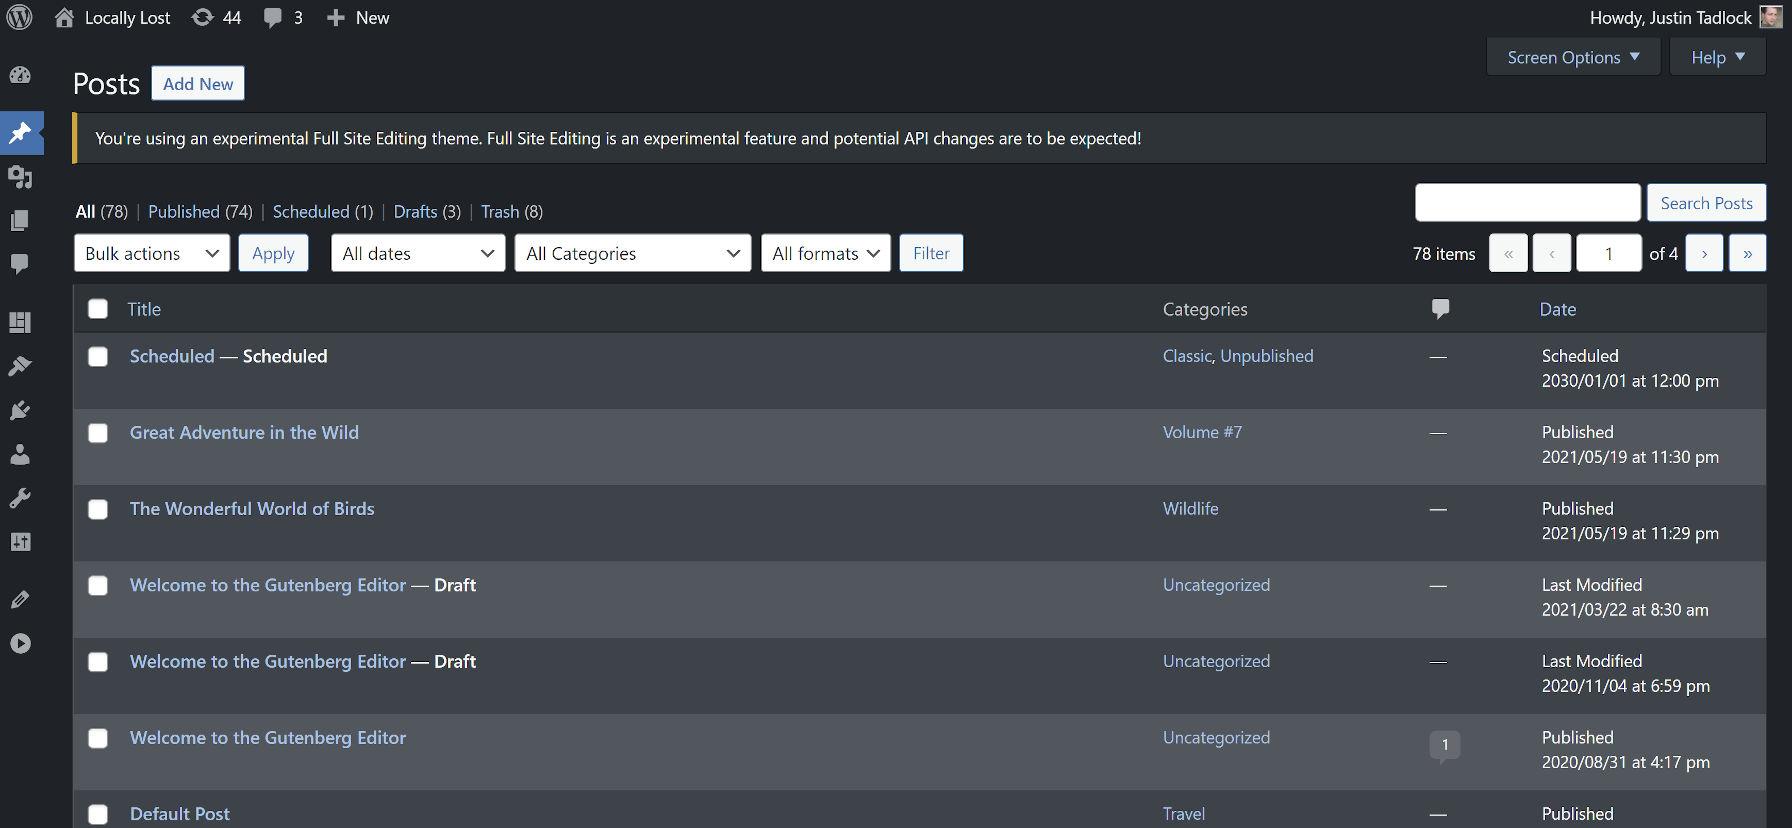 Viewing the WordPress manage posts screen in dark mode.